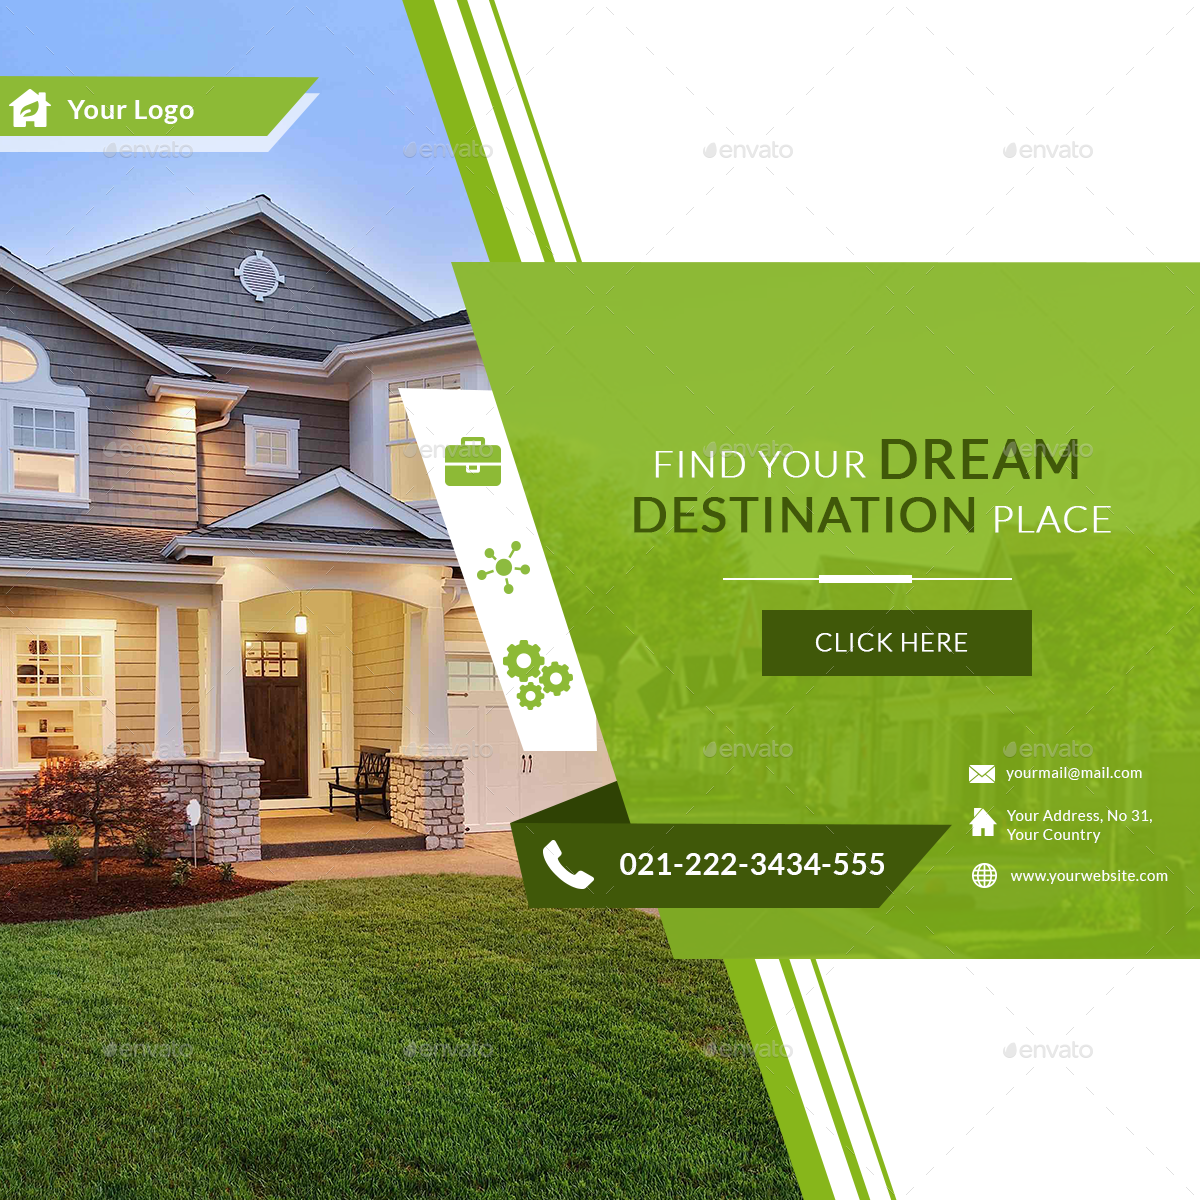 Real Estate Fb Ad Banners Ar Promotional Design Real Estate Banner Business Brochure Design